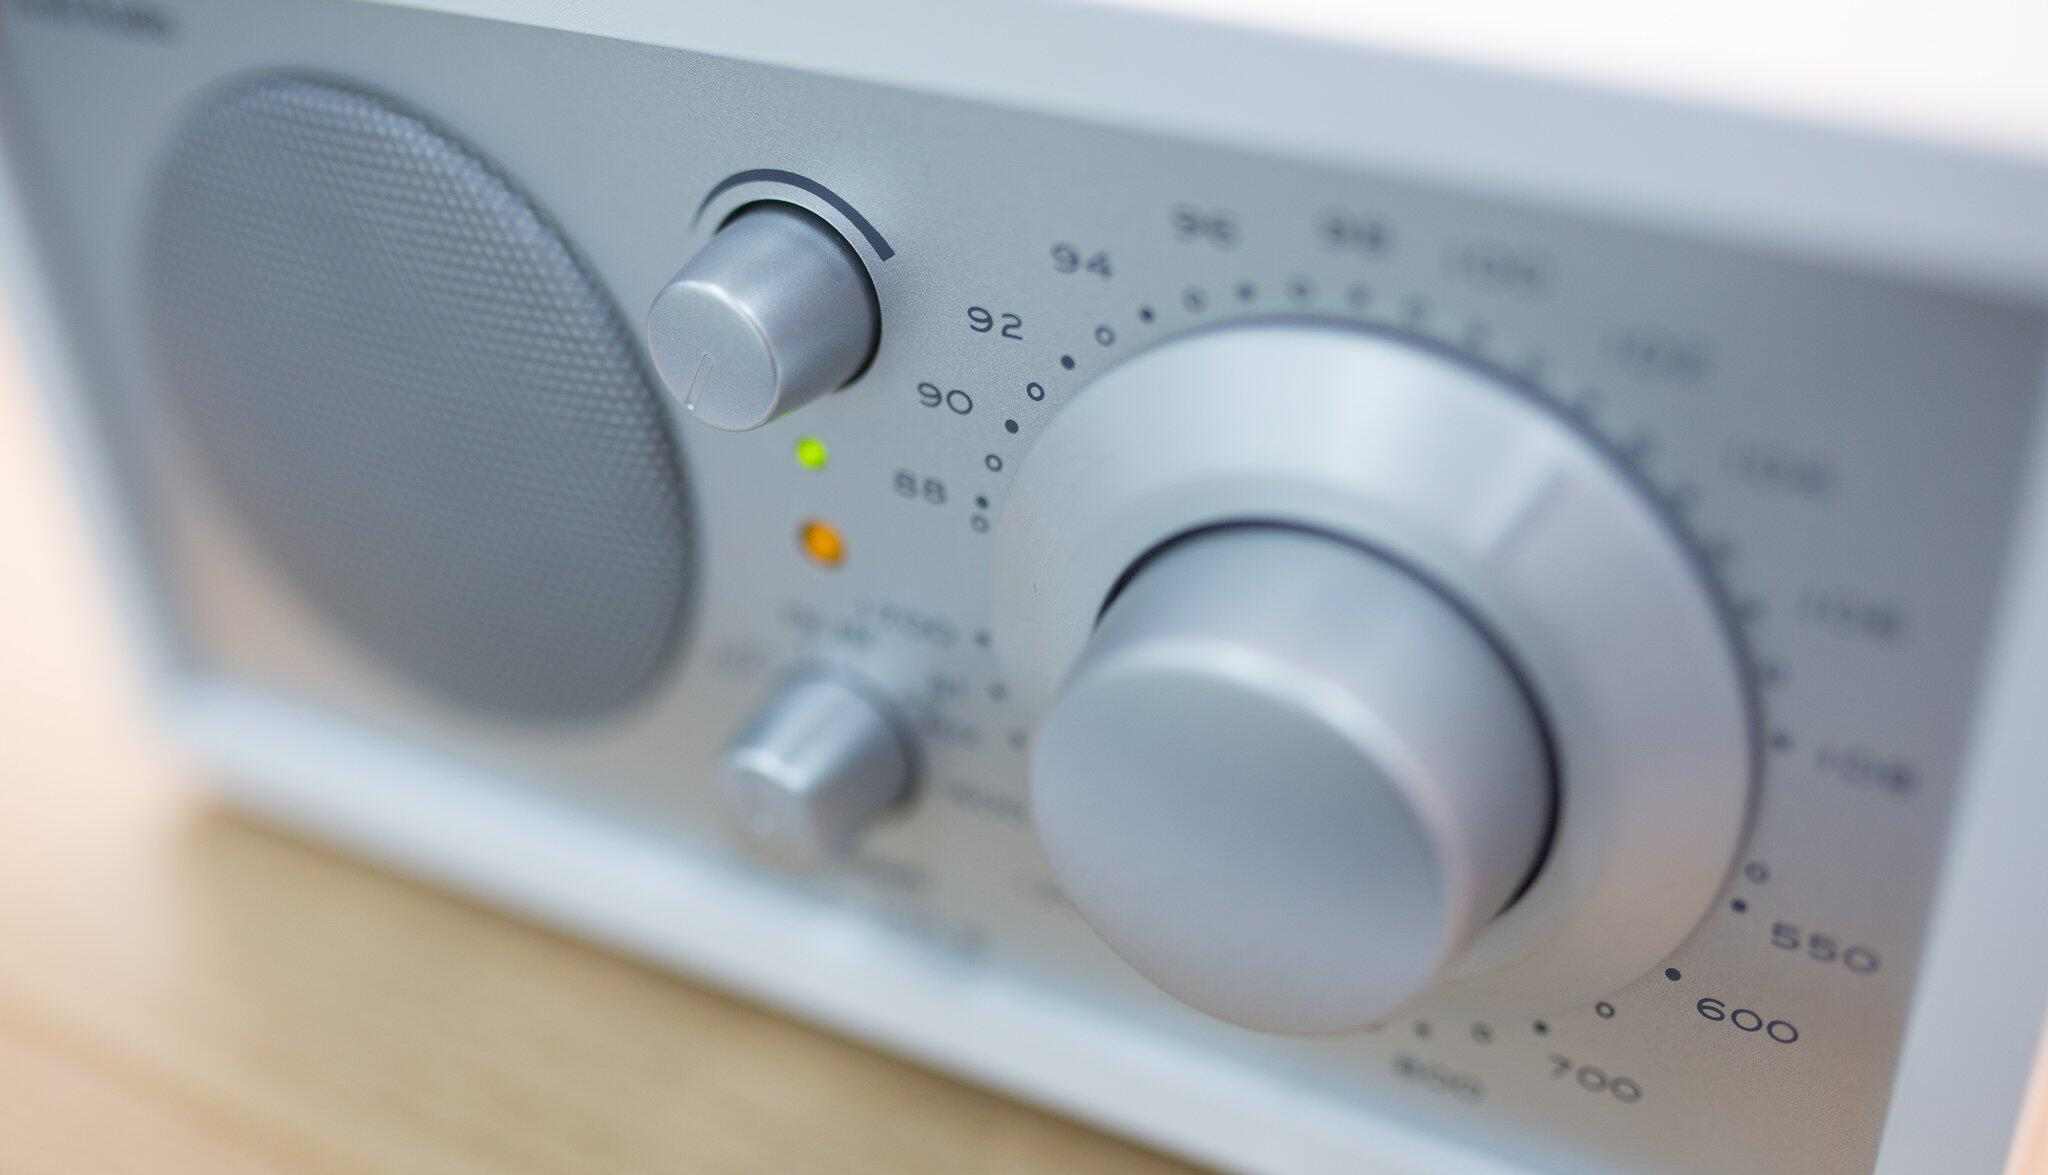 Bild zu Radionutzung - Radiogerät